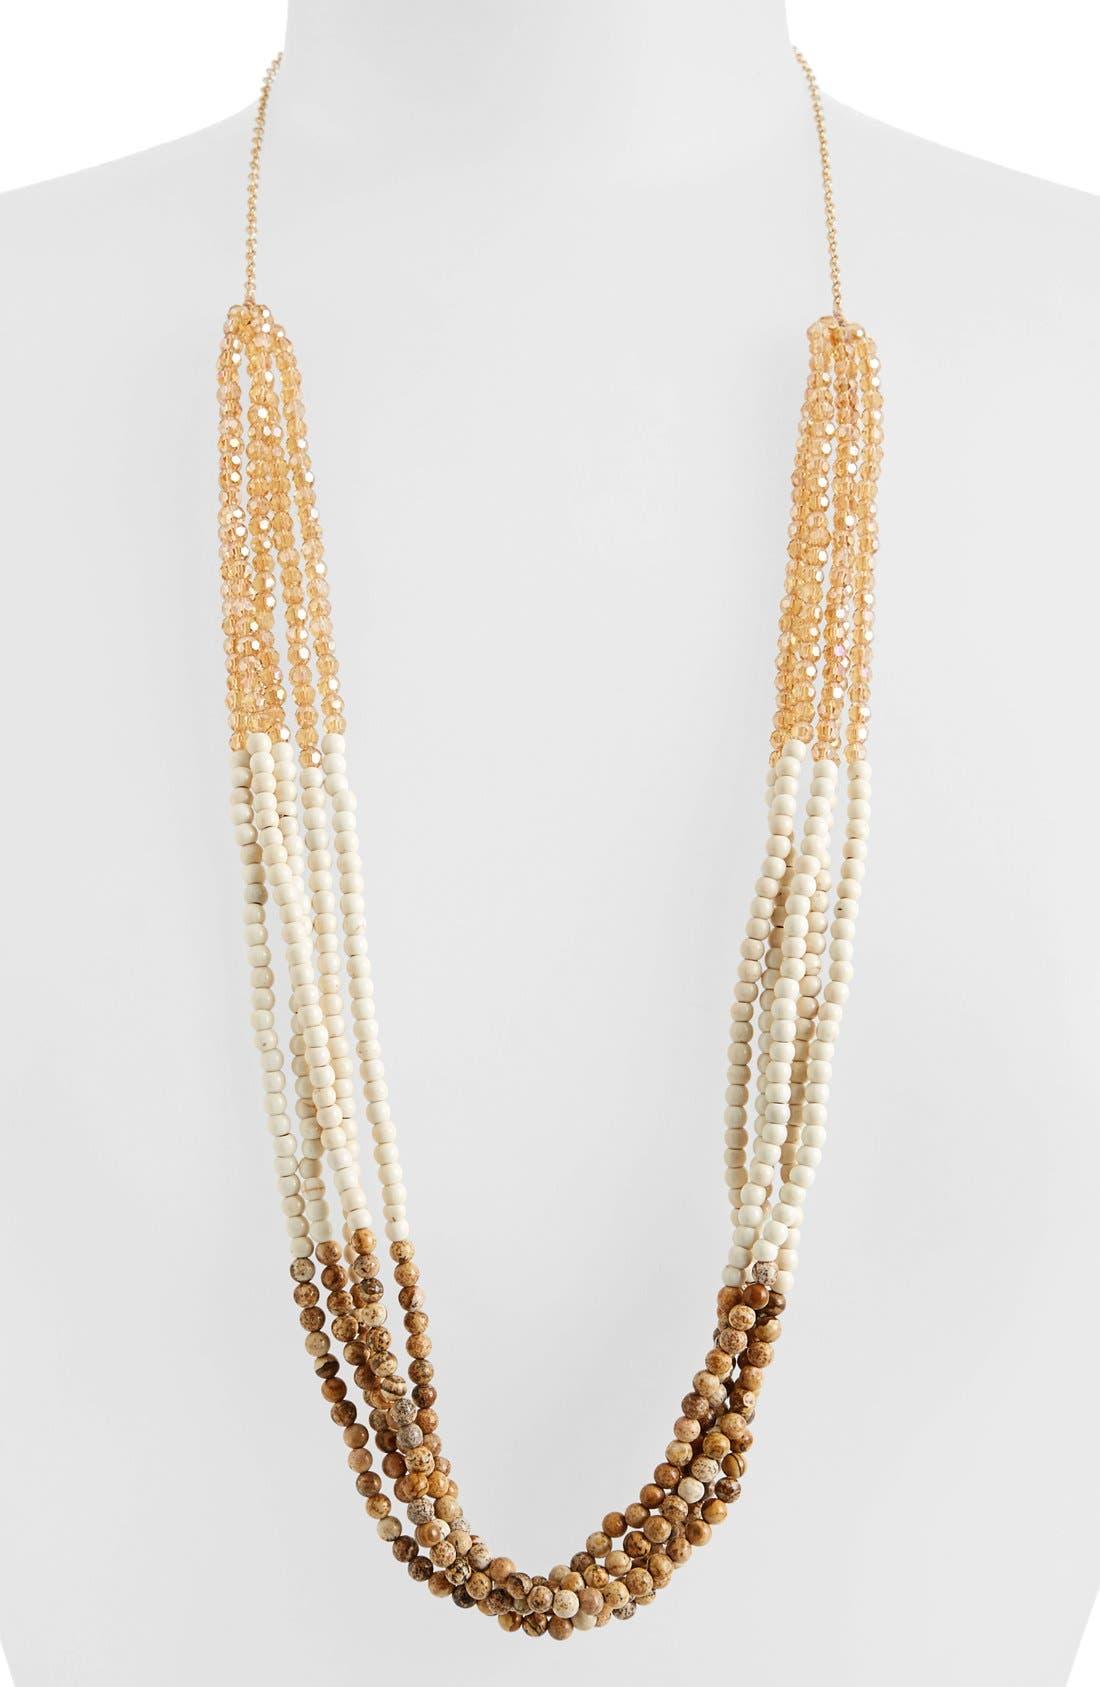 Main Image - Panacea Jasper & Howlite Multi Strand Necklace